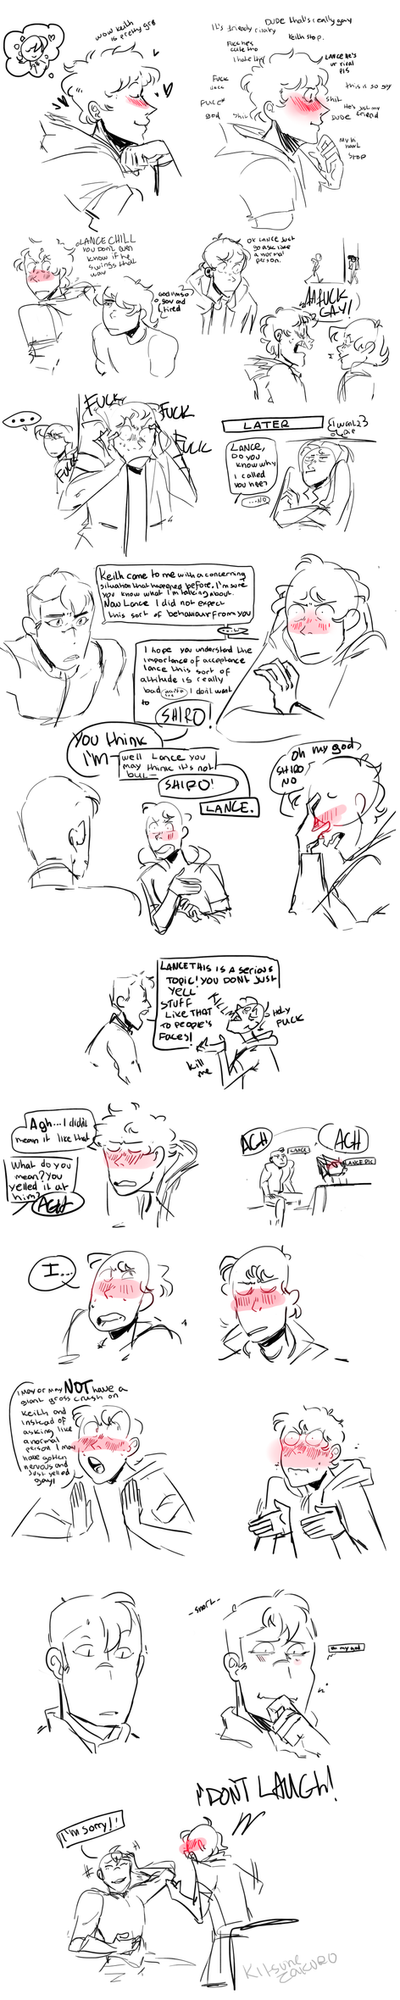 Tfw u yell gay at ur cursh by KitsuneZakuro